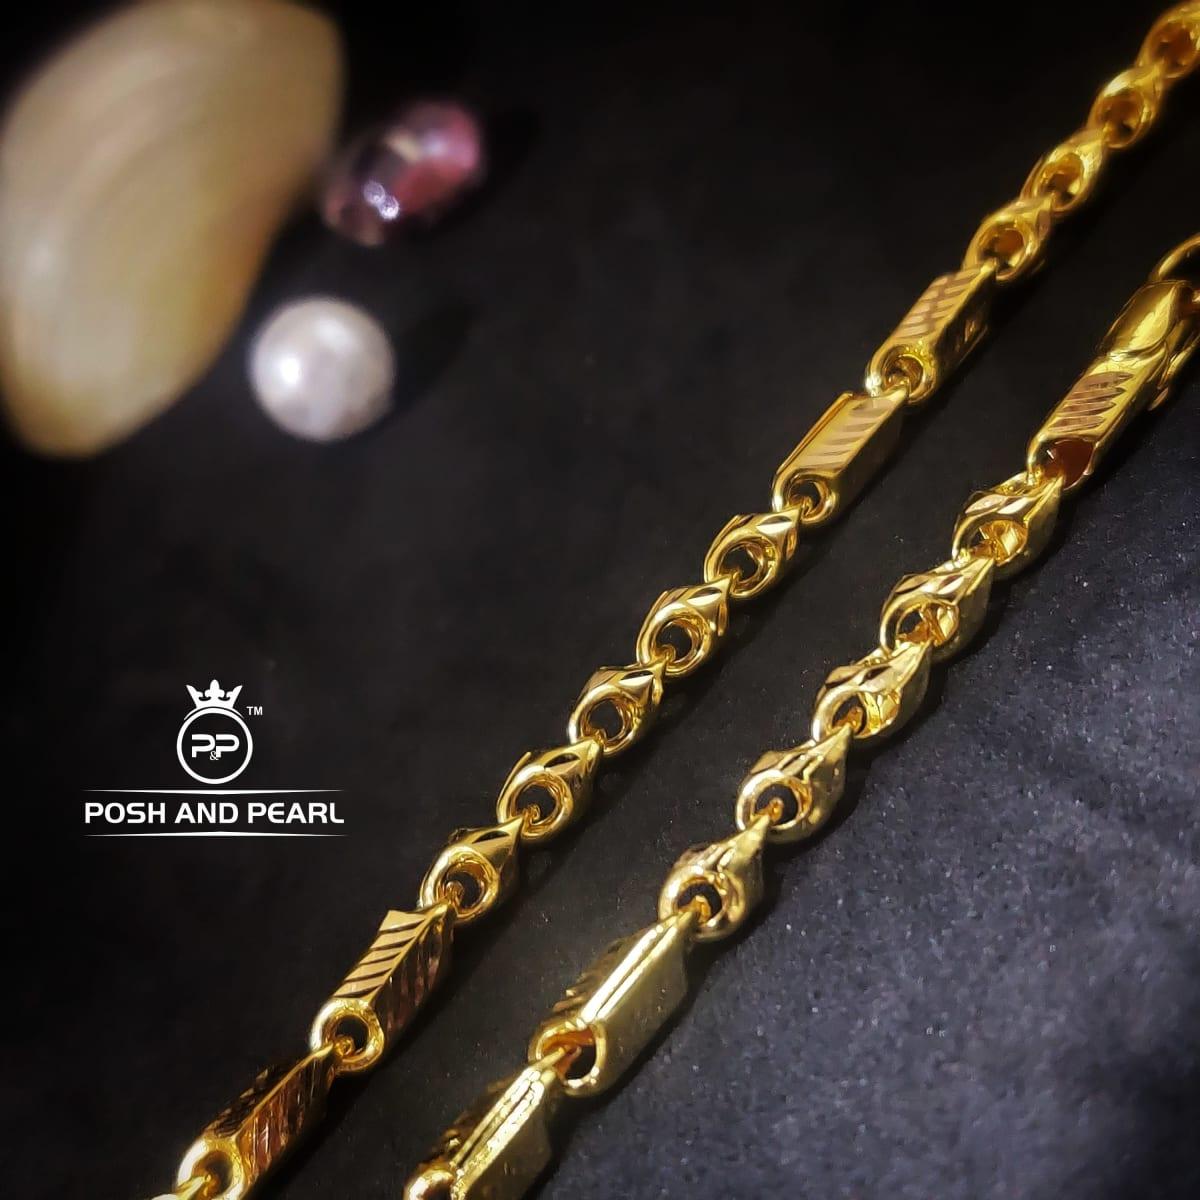 Bahubali Chain Pp0247